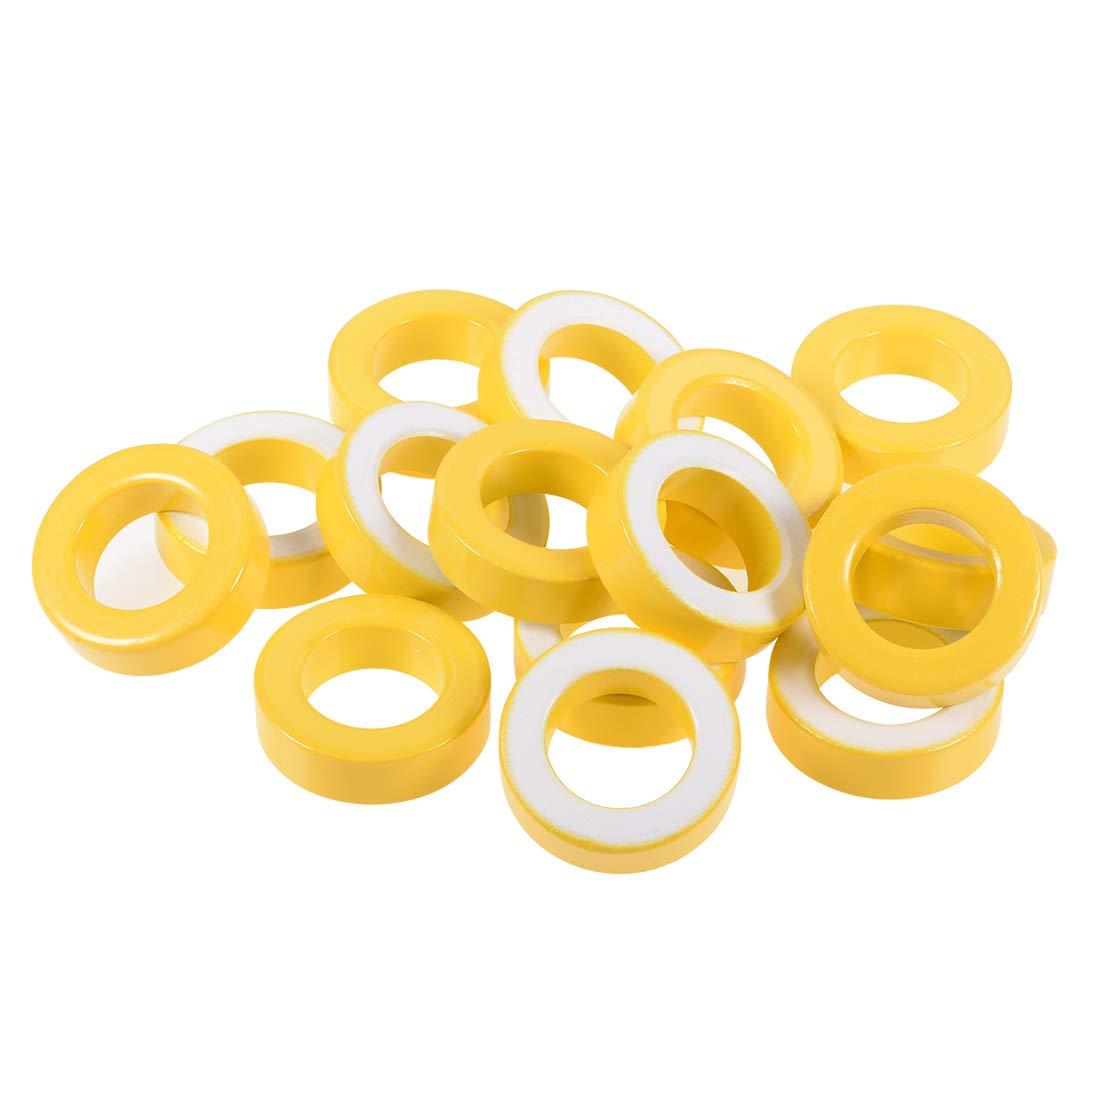 uxcell 15pcs 22 x 36.5 x 11mm Ferrite Ring Iron Powder Toroid Cores Yellow White